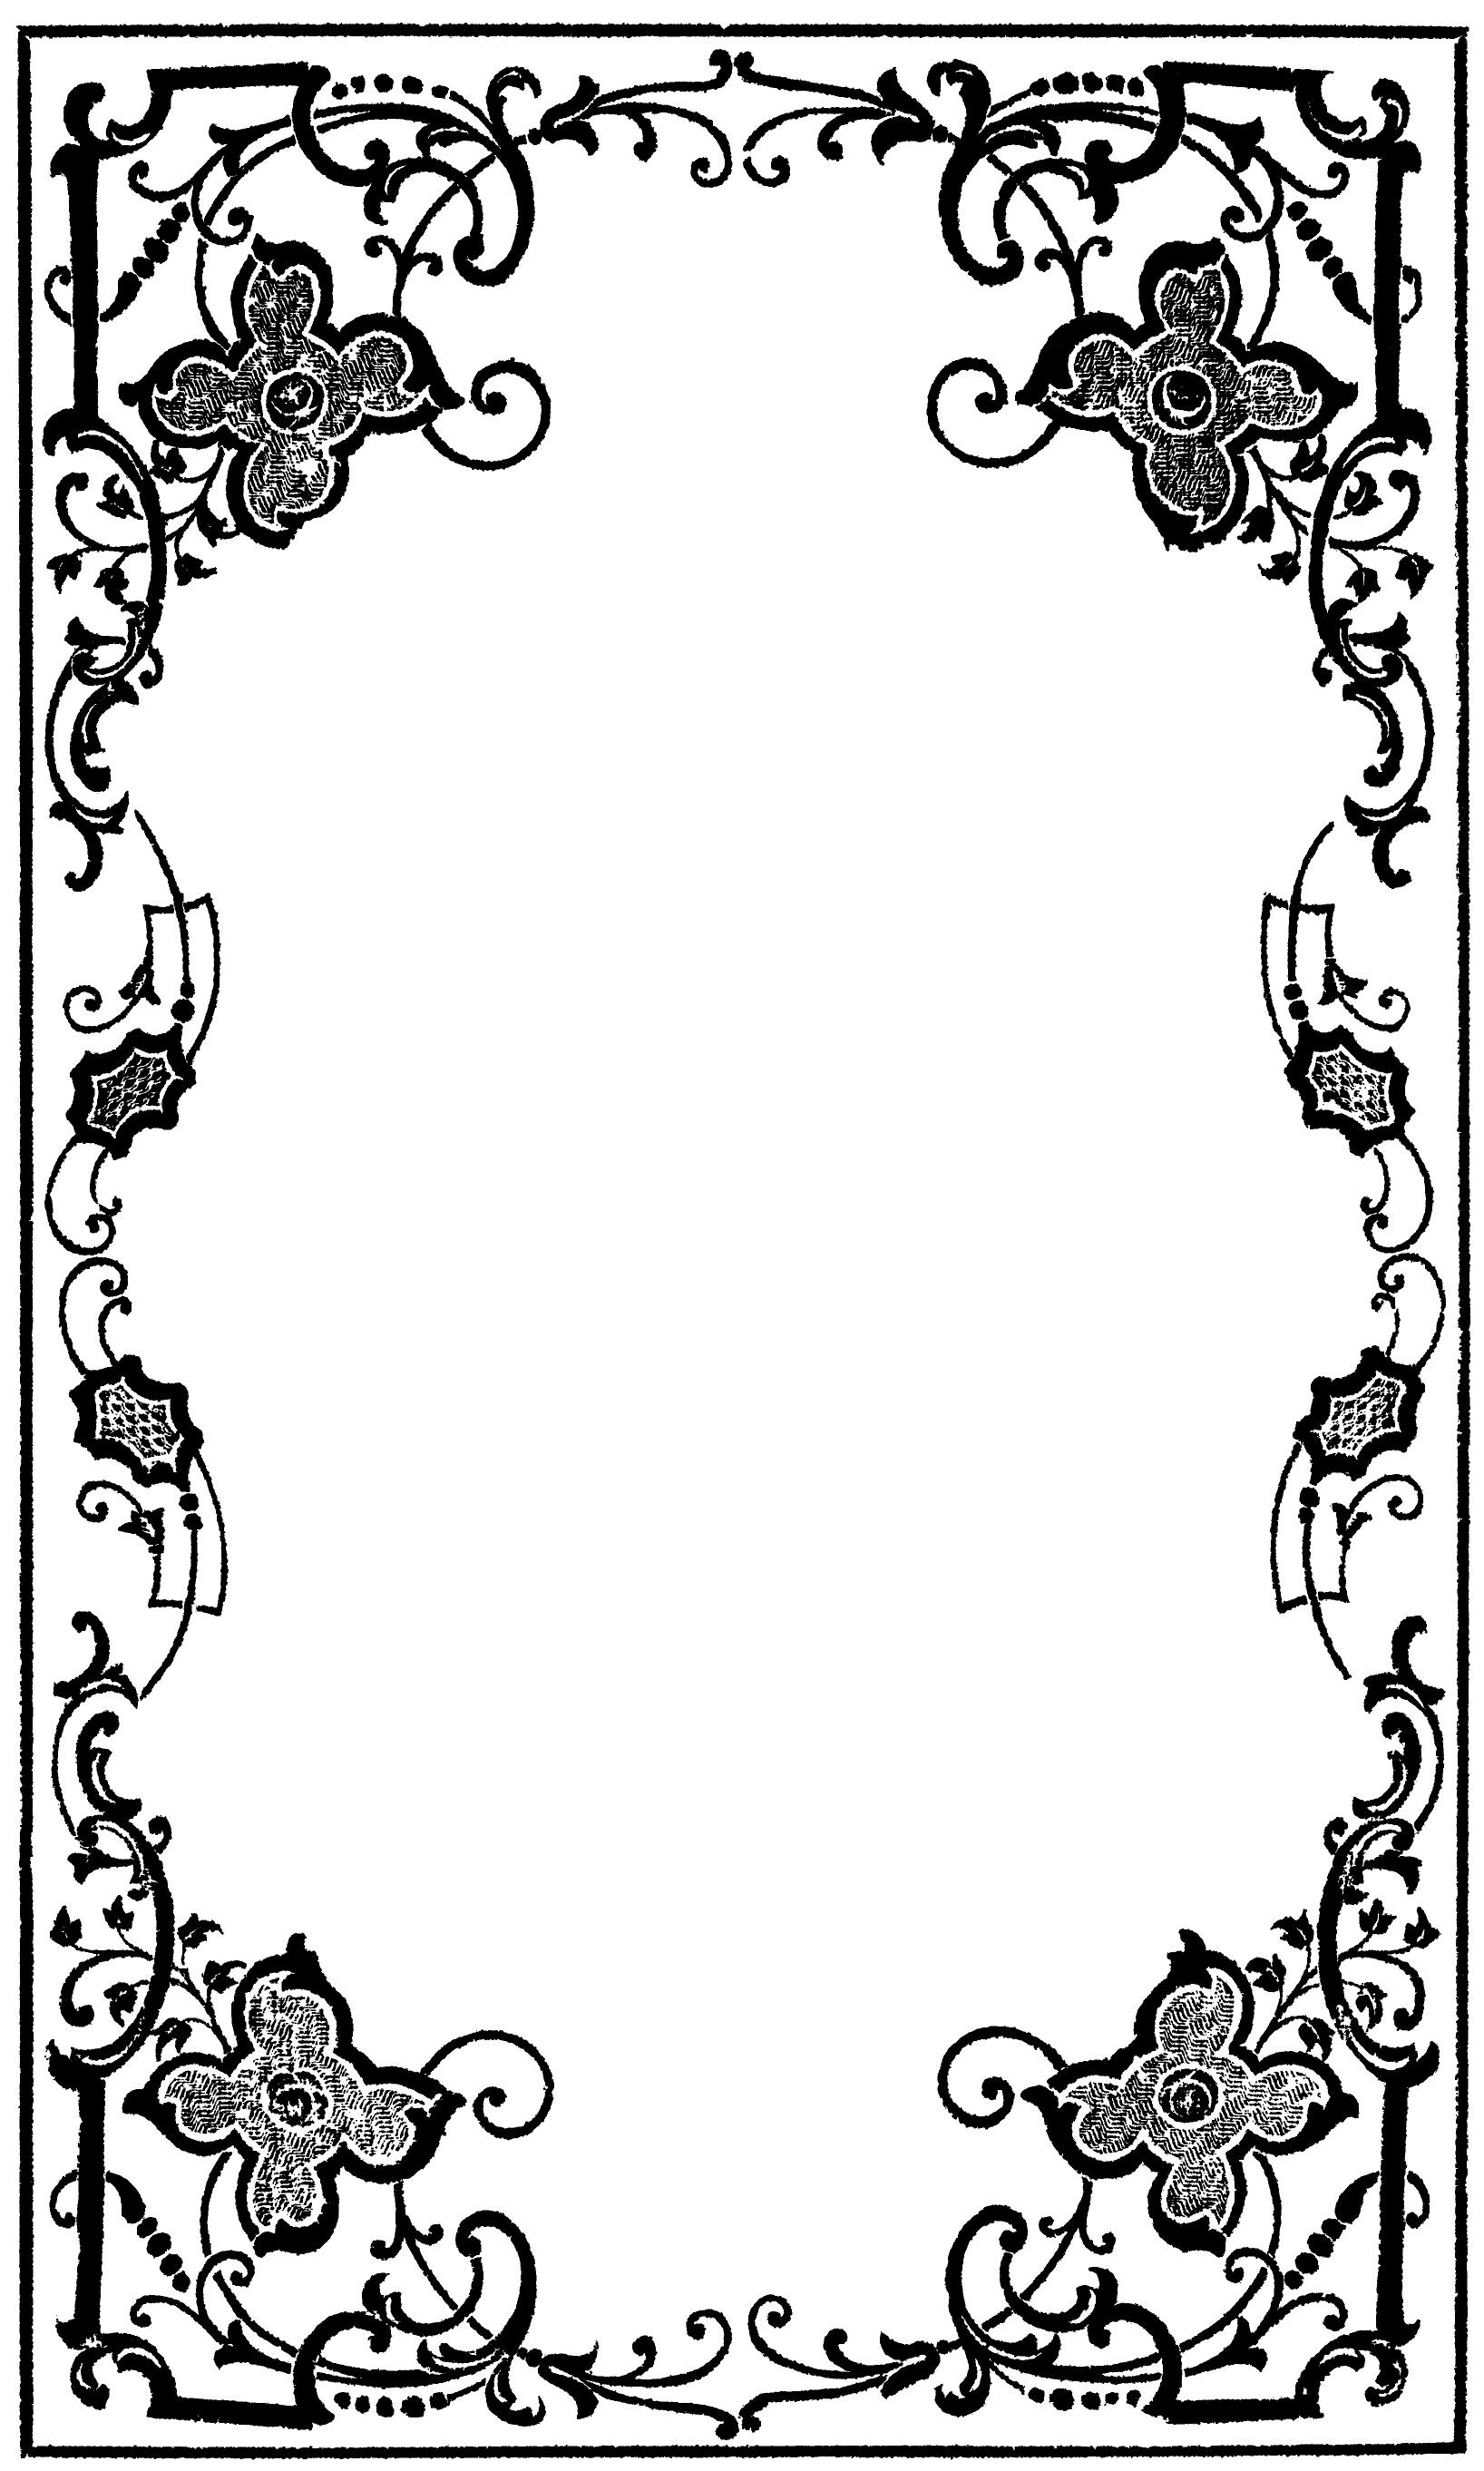 Free victorian frame.